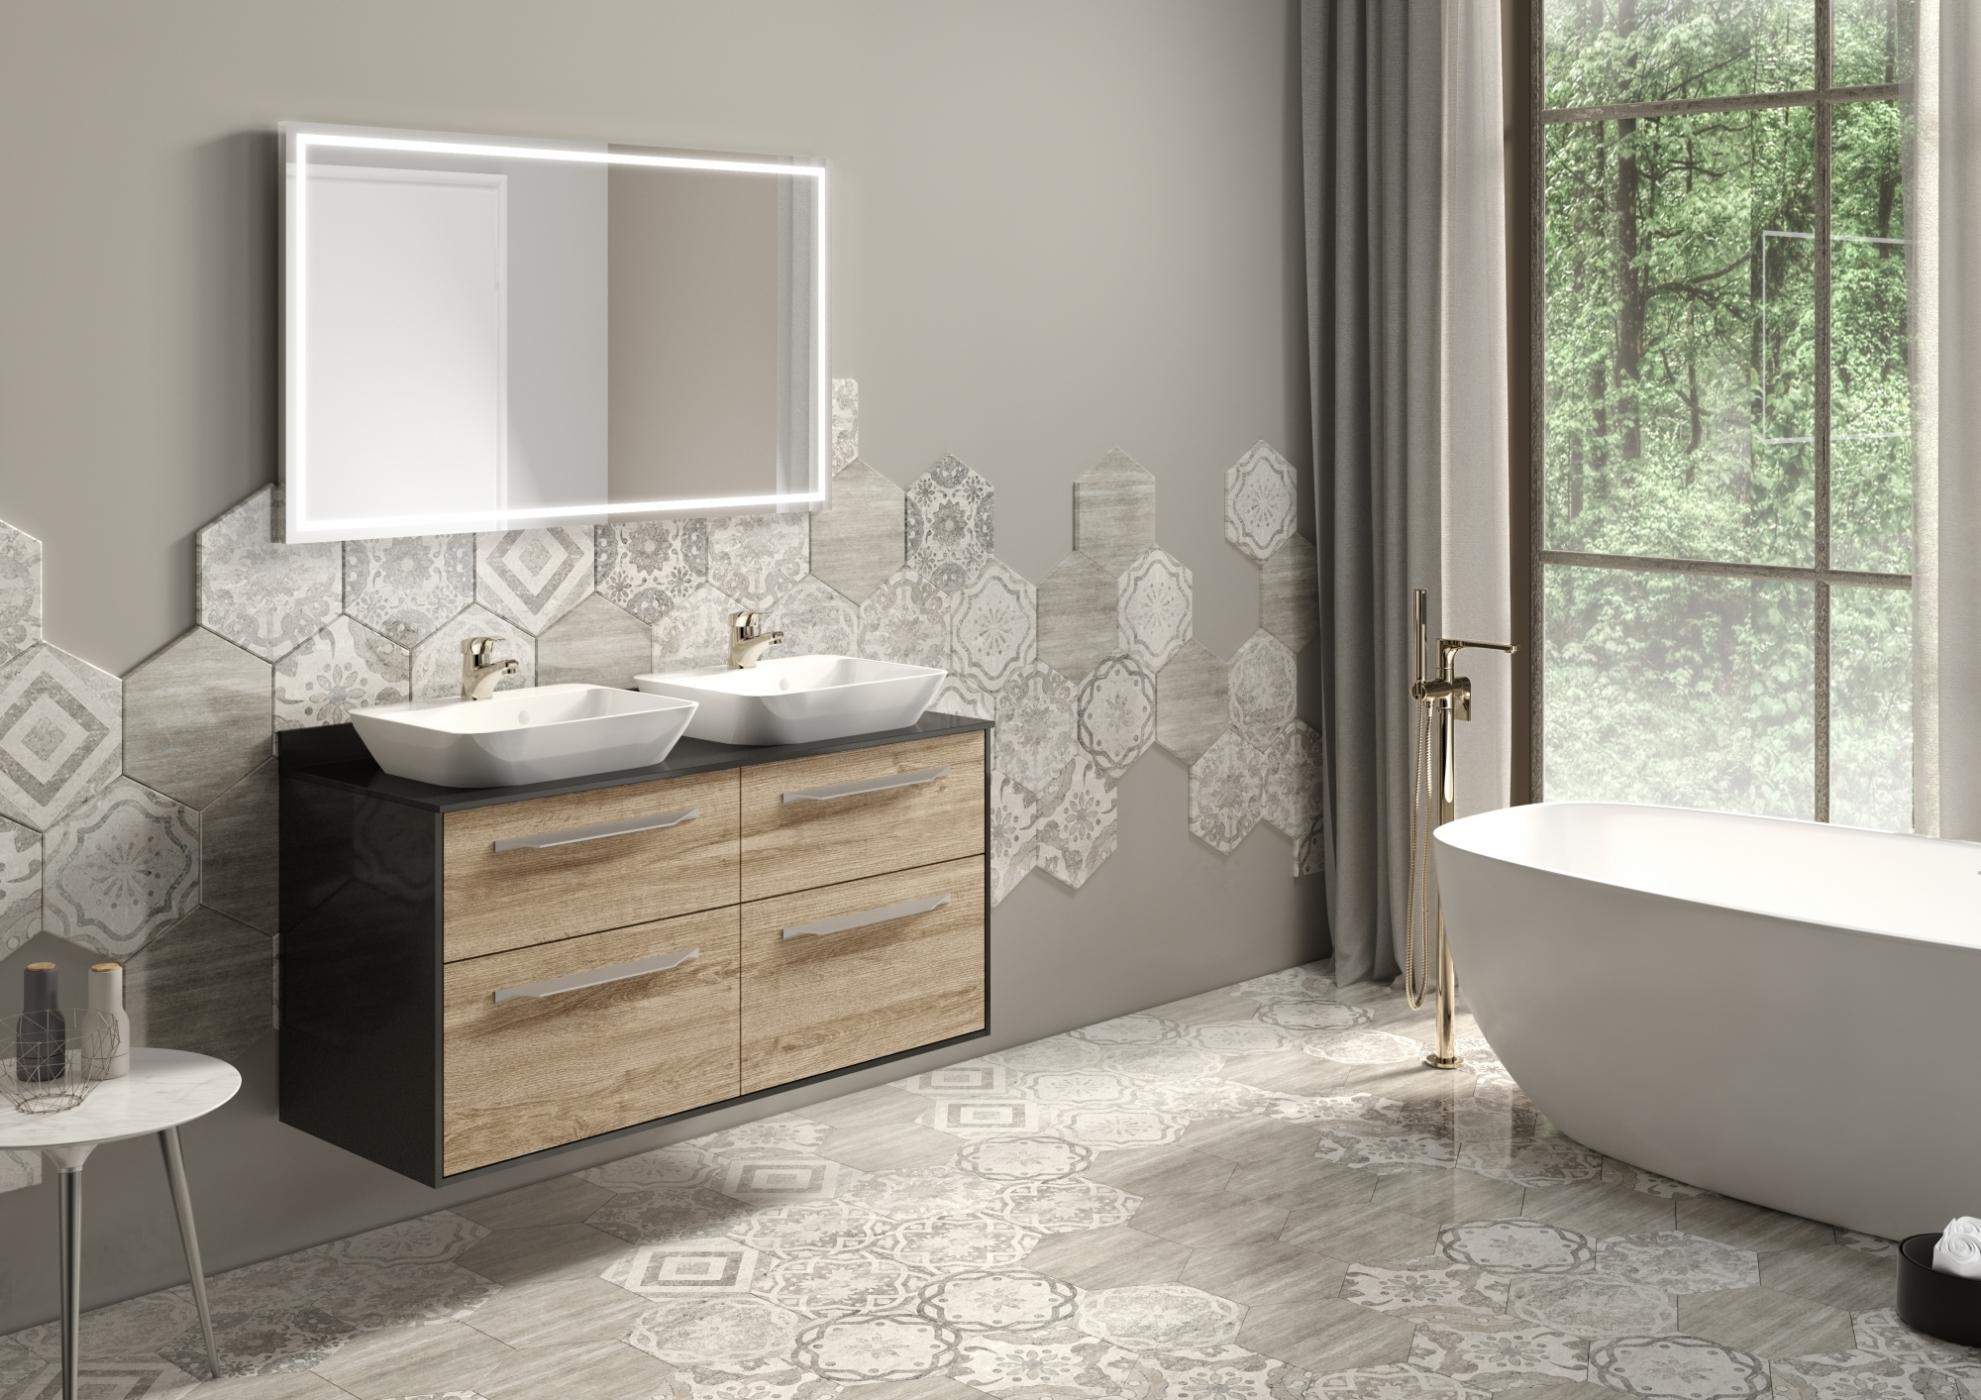 Odeya mobilier de salle de bain